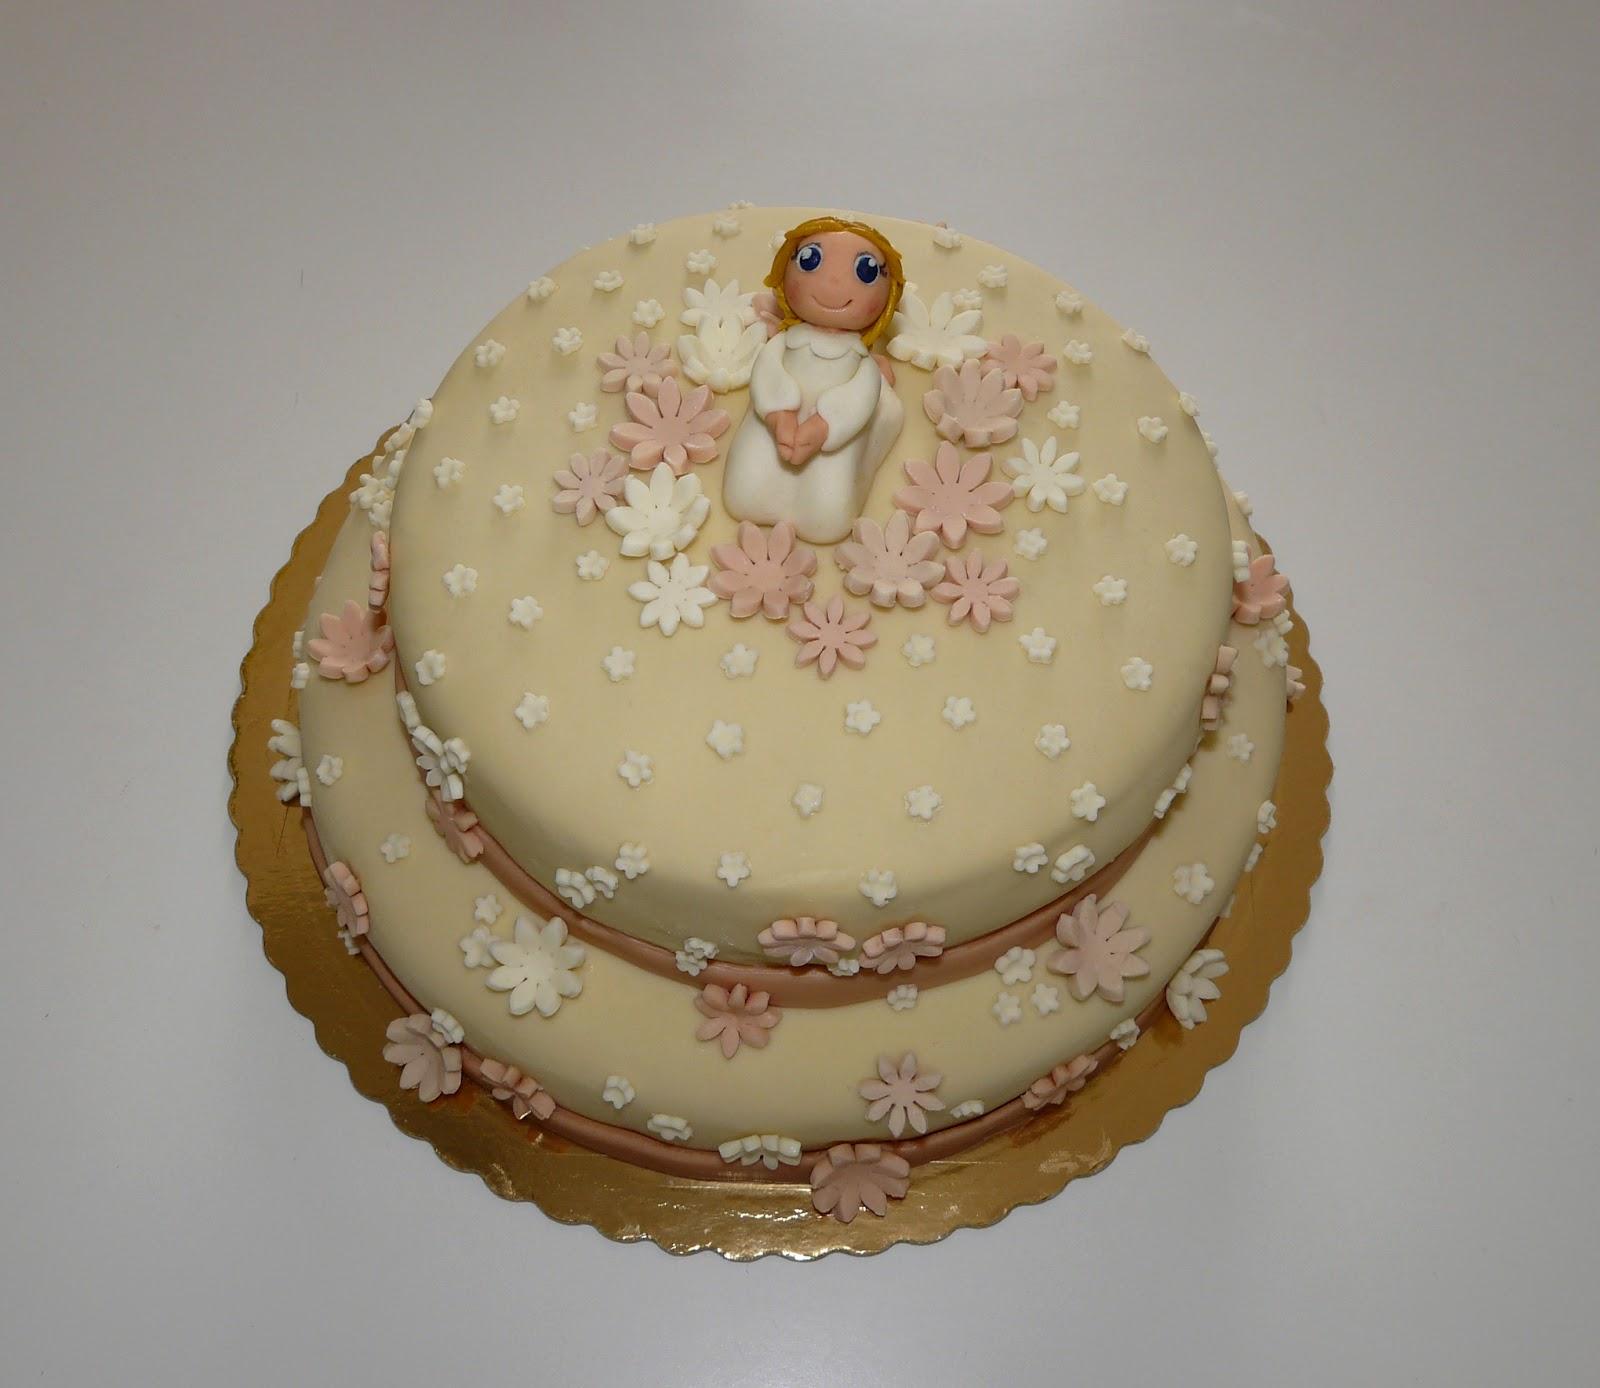 Ben noto La Cucina di Anita: Una torta di Prima Comunione XG92